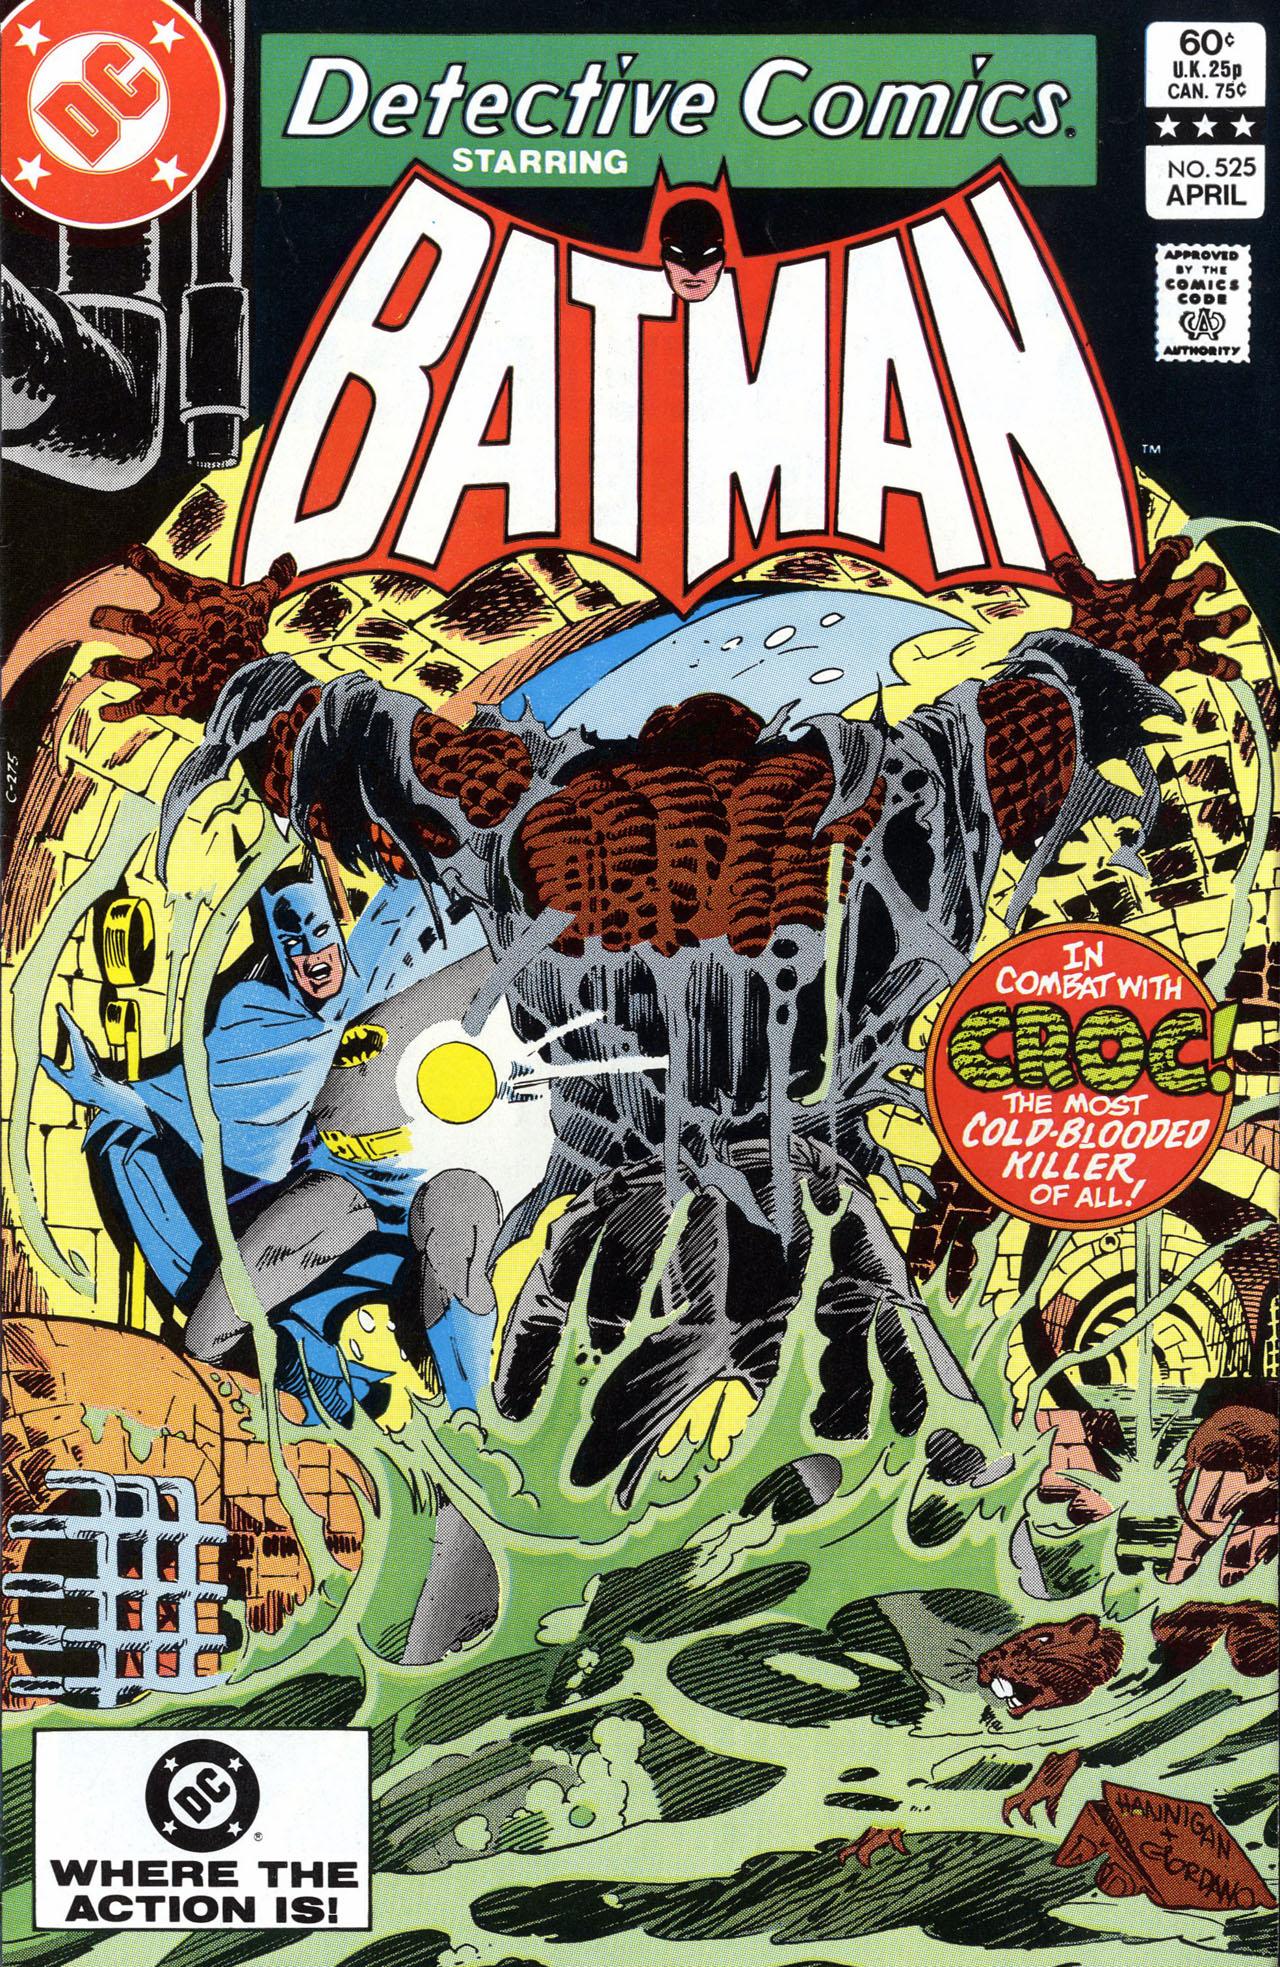 Detective Comics (1937) 525 Page 1